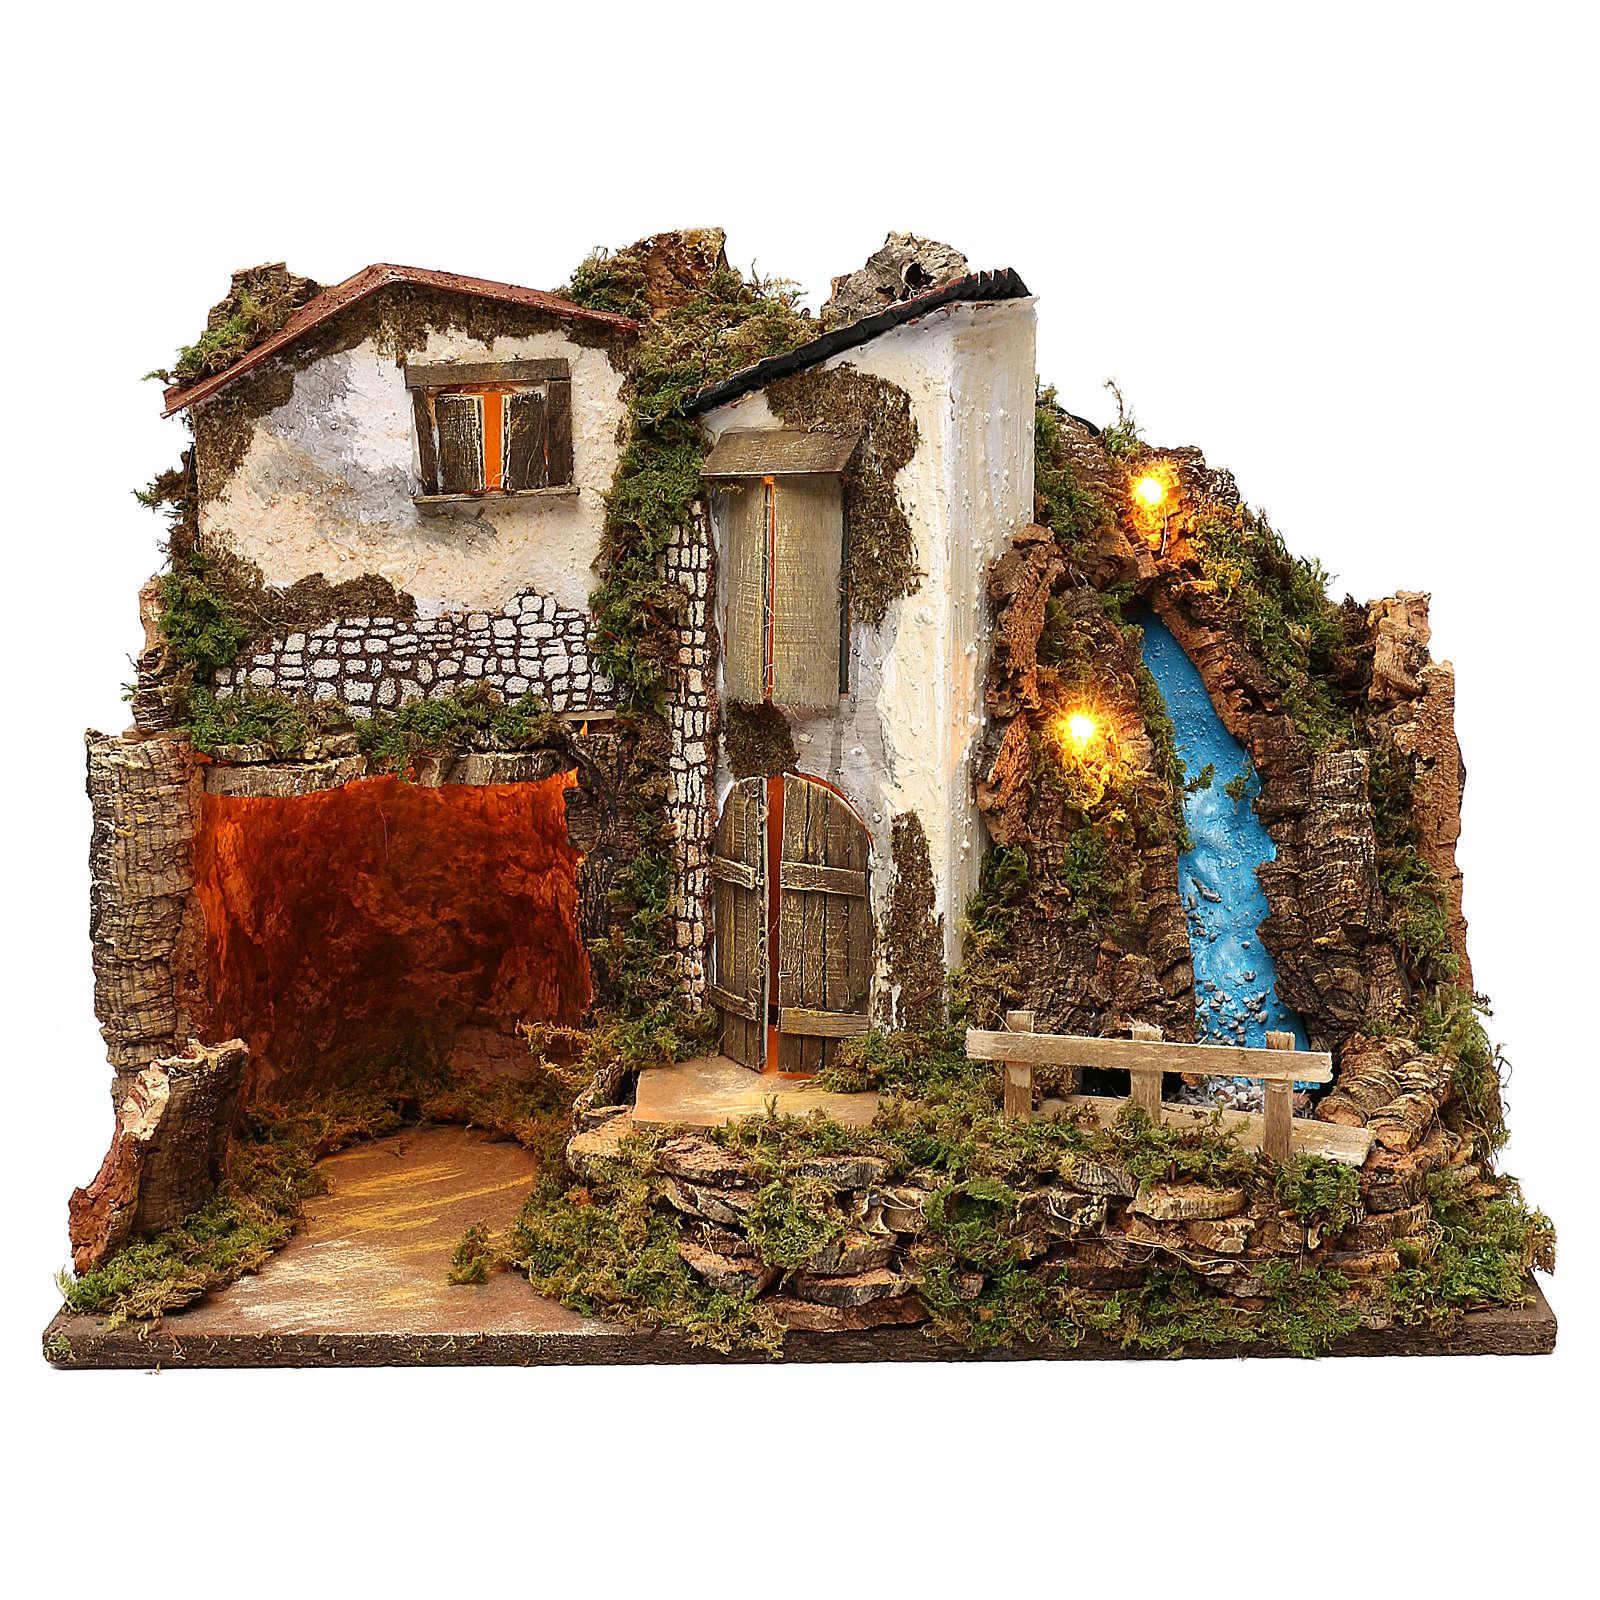 Casa rústica con luces y cascada 35x50x25 cm para belenes 11 cm 4